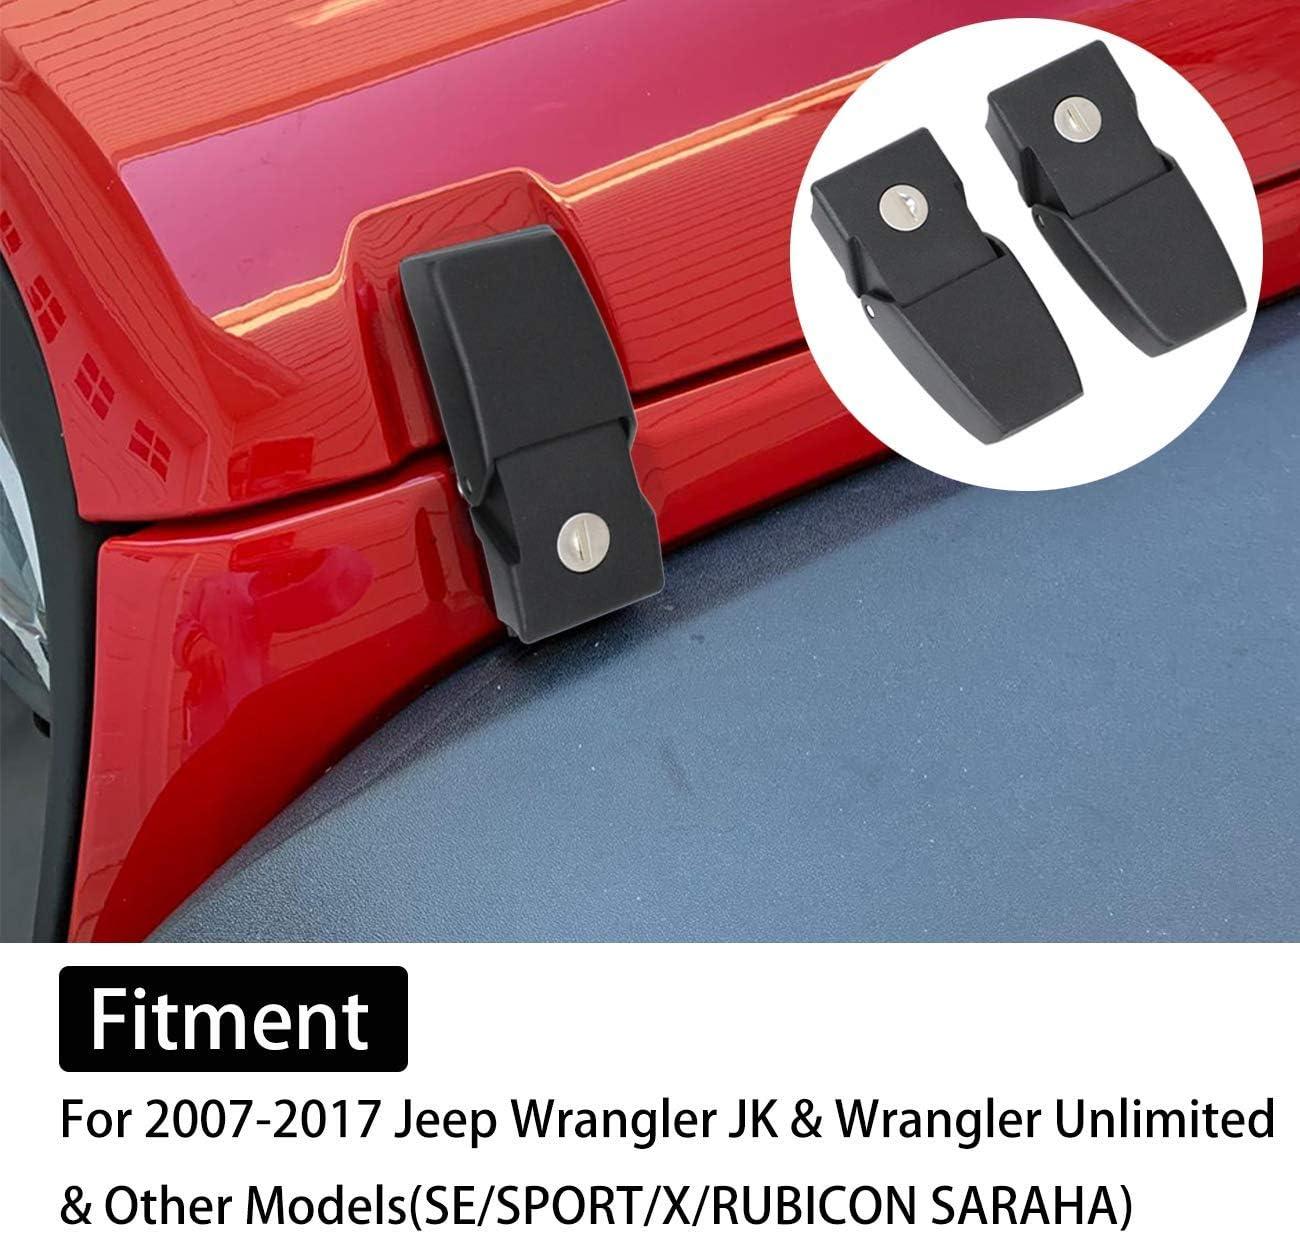 MFC Anti-Thief Hood Lock Catch Latches Kit Assembly for Jeep Wrangler JK JKU 2007-2017 2 Door 4 Door Stainless Steel Hood Lock